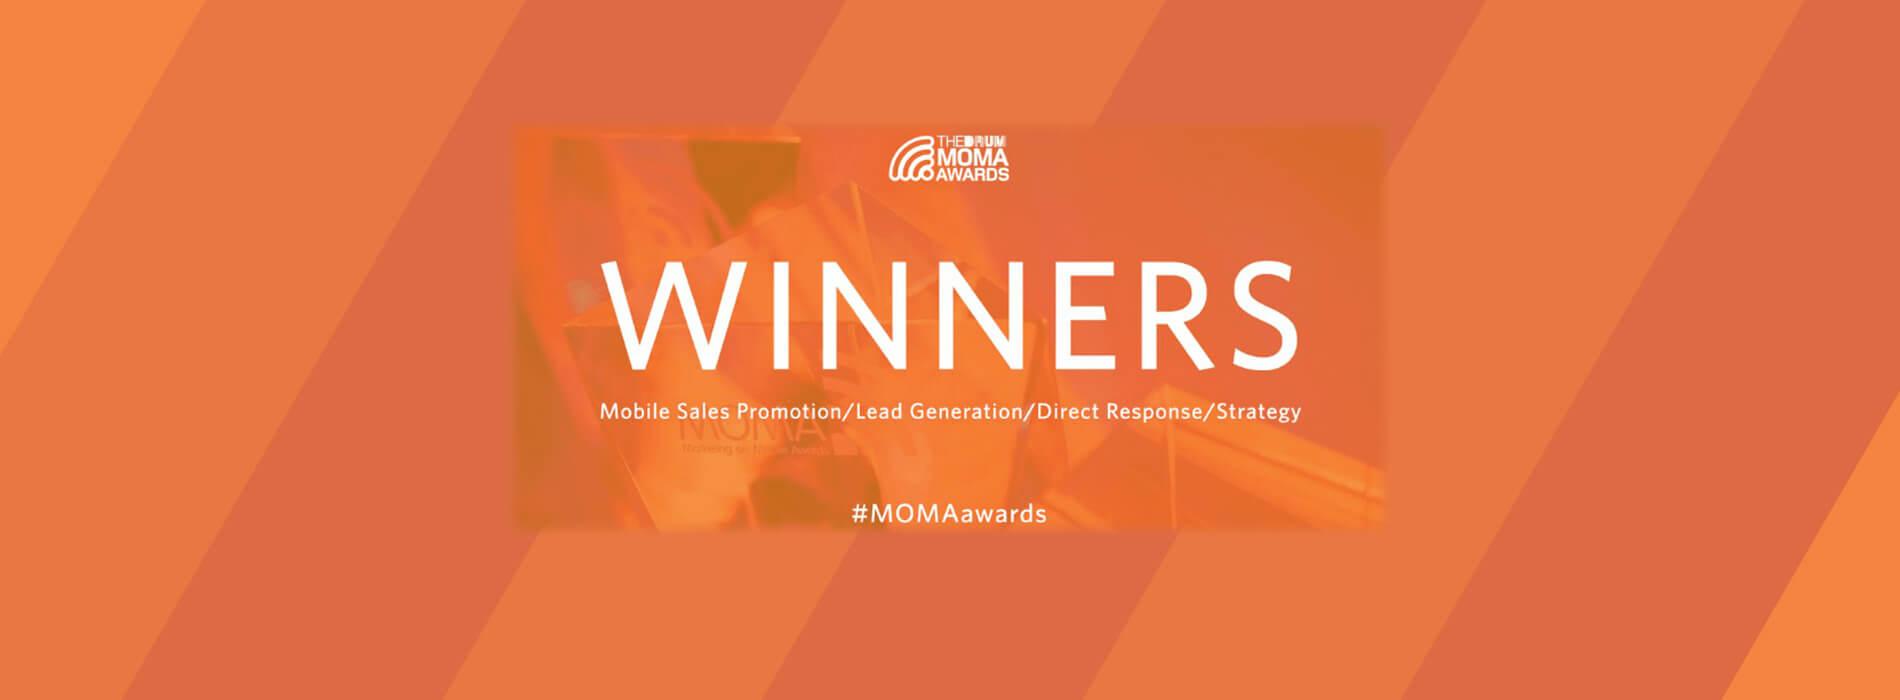 SaleCycle's Award-Winning SMS Remarketing